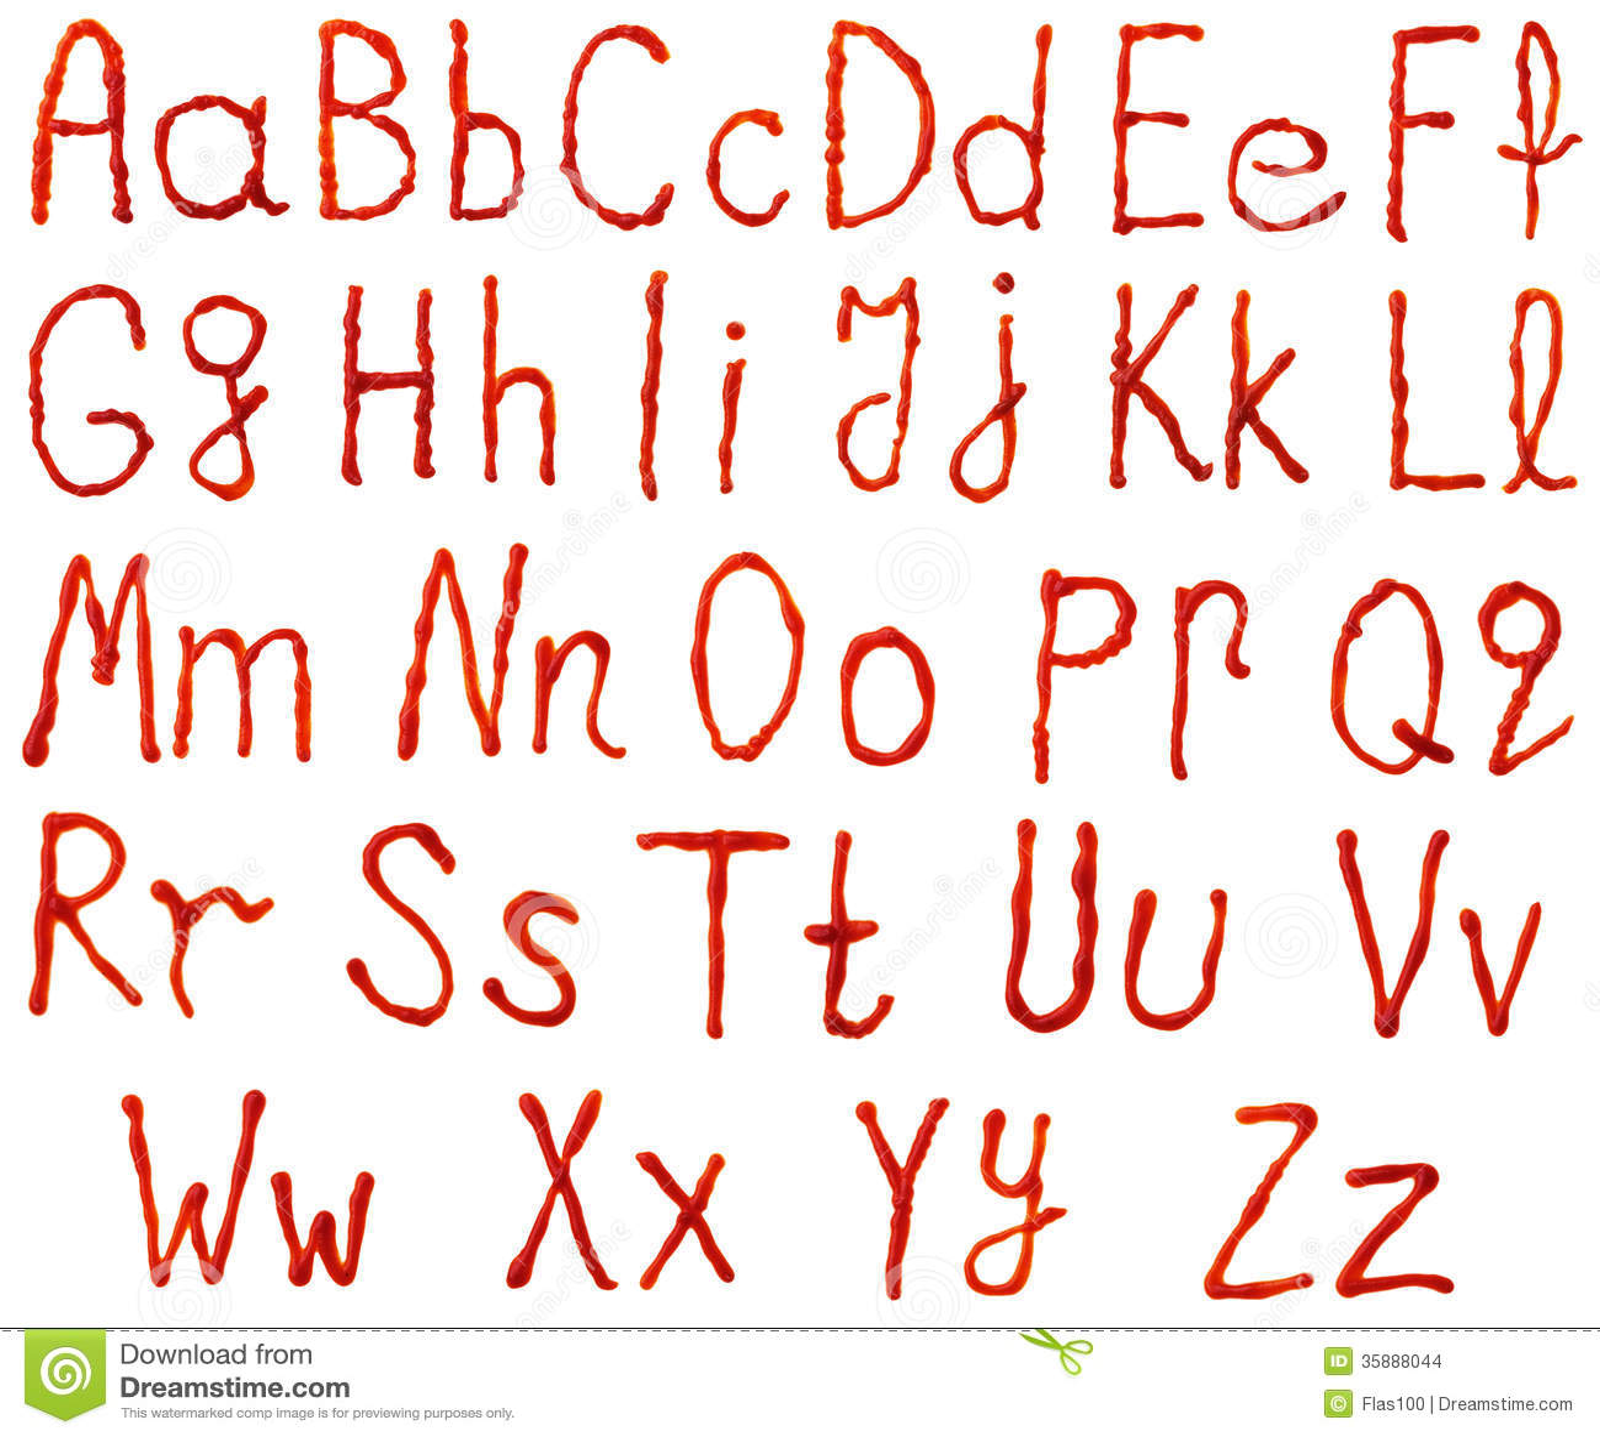 Letters of the Alphabet AZ to Print  Printable Alphabet